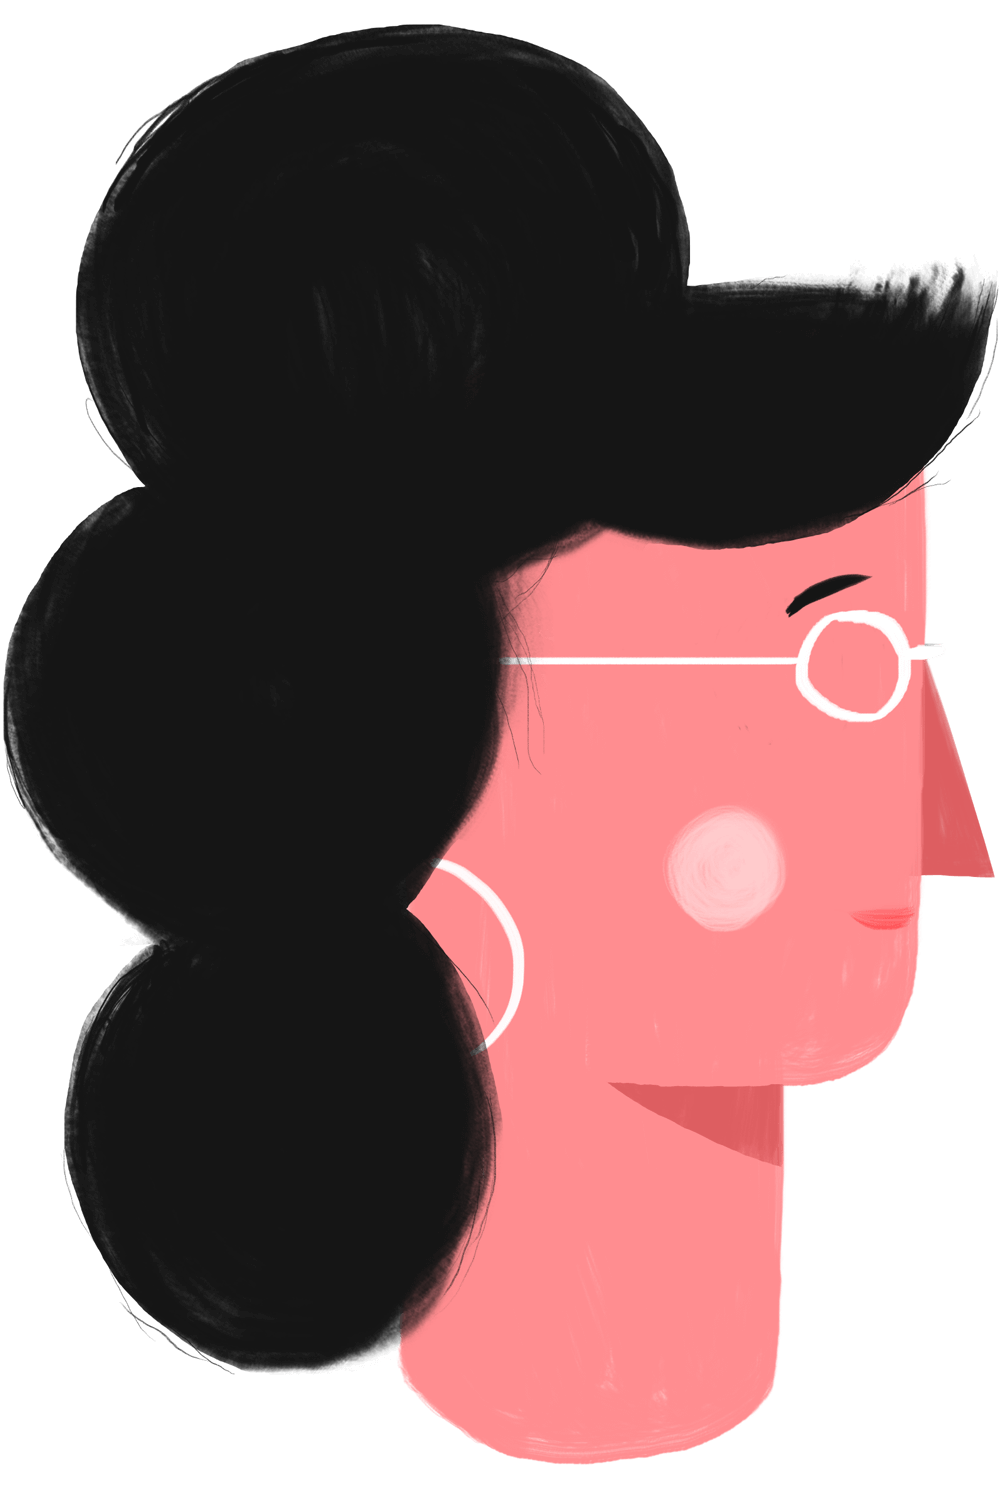 Flat, 2D illustration of a woman's head